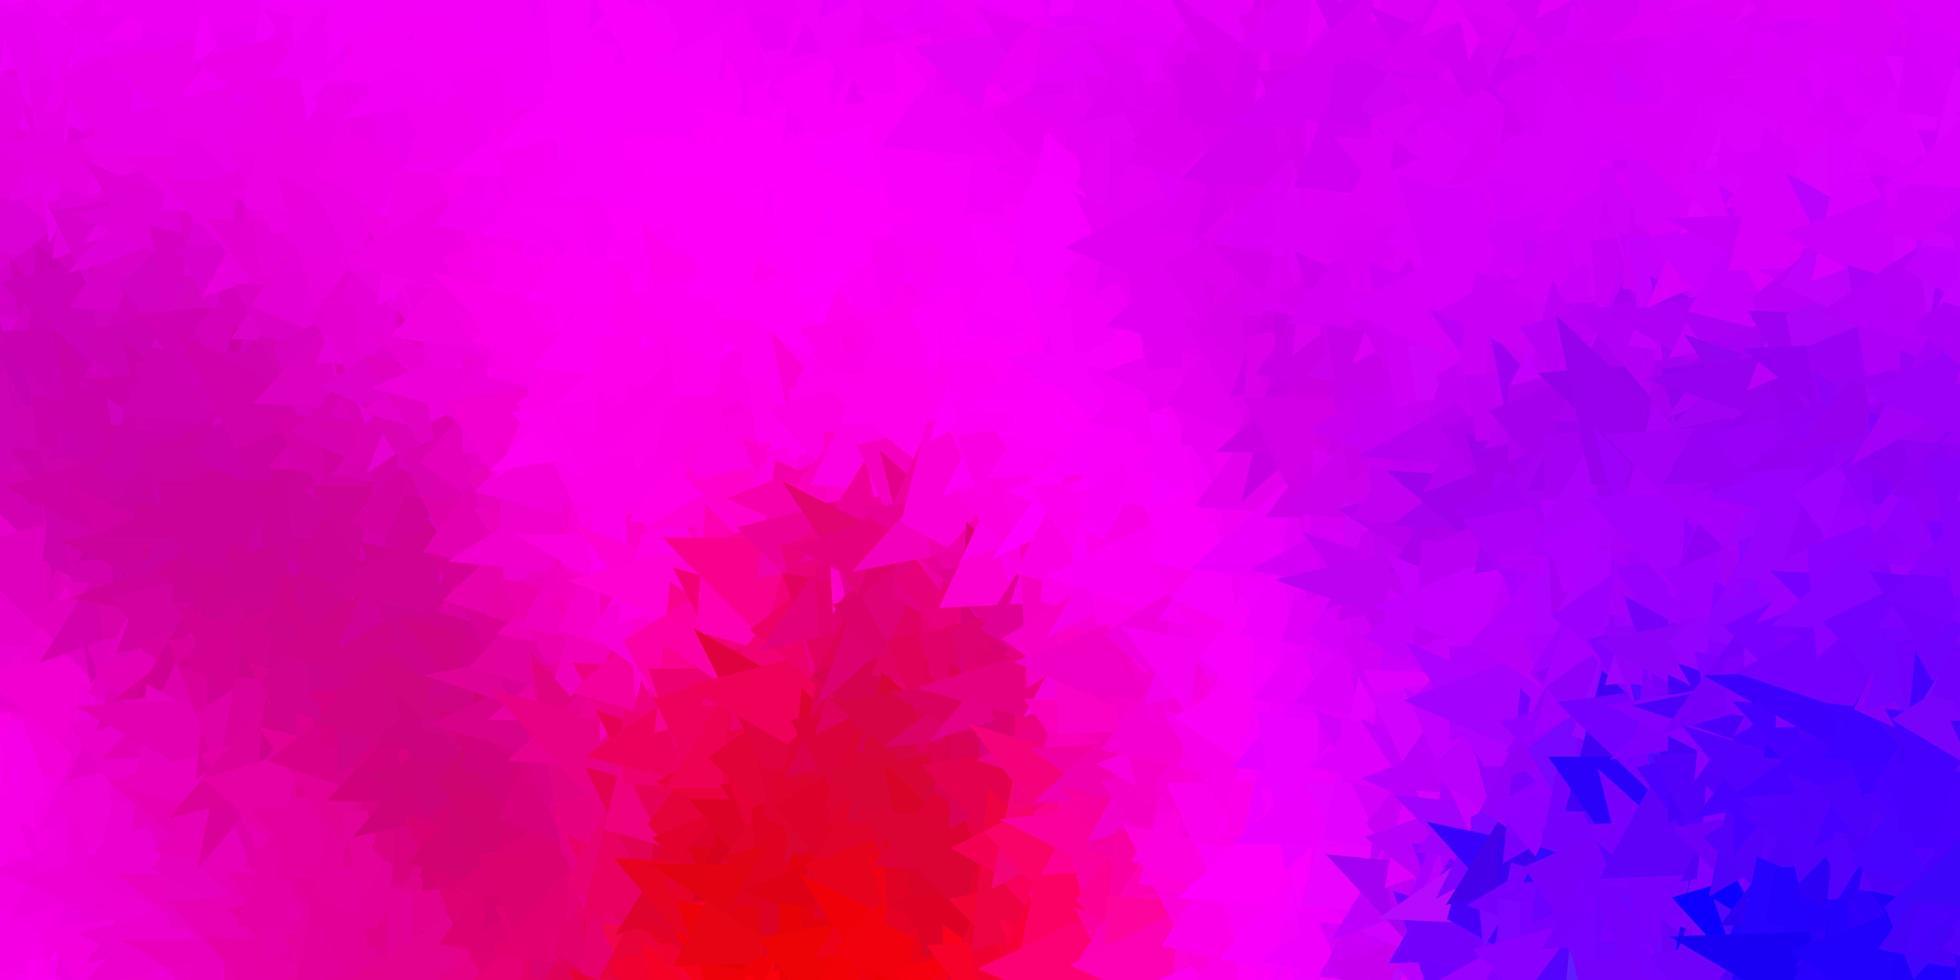 geometrische polygonale Tapete der dunkelrosa, roten Vektor. vektor